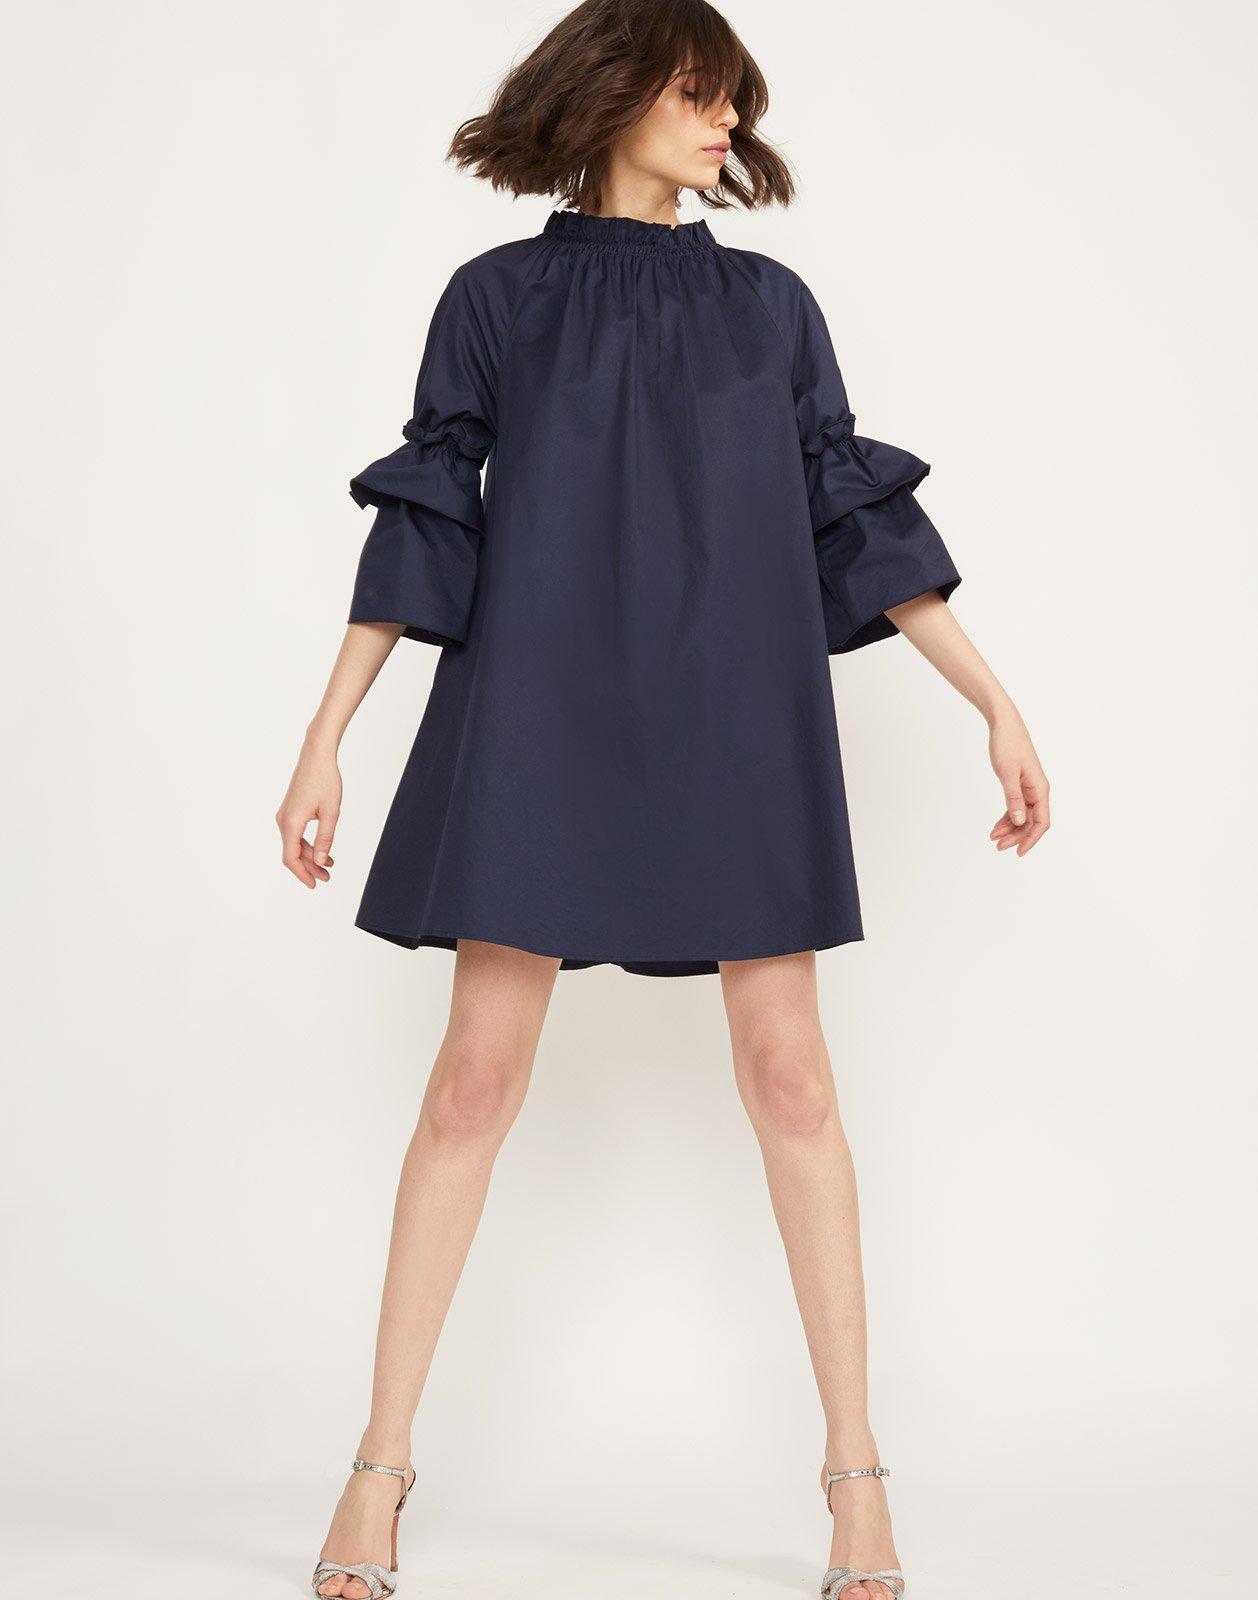 43f773bbc444 Cynthia Rowley Eden Smocked Ruffle Neck Mini Dress in Blue - Save 10% - Lyst